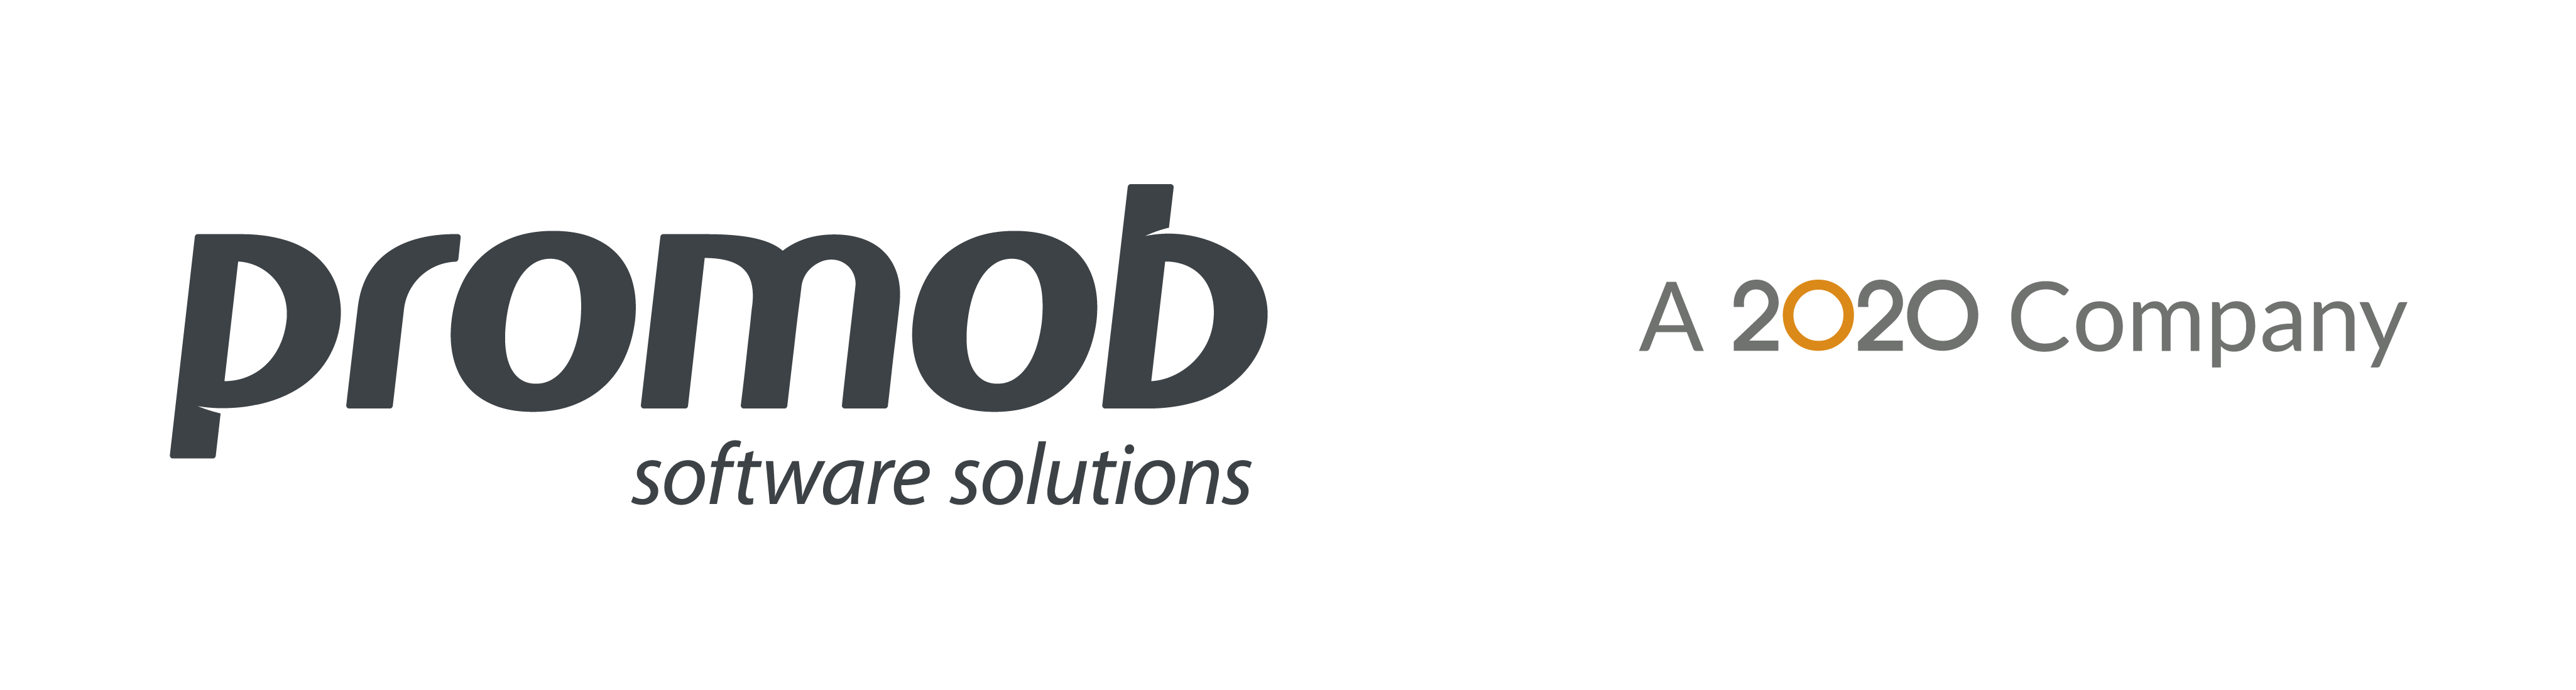 Promob software logo chumbo 2